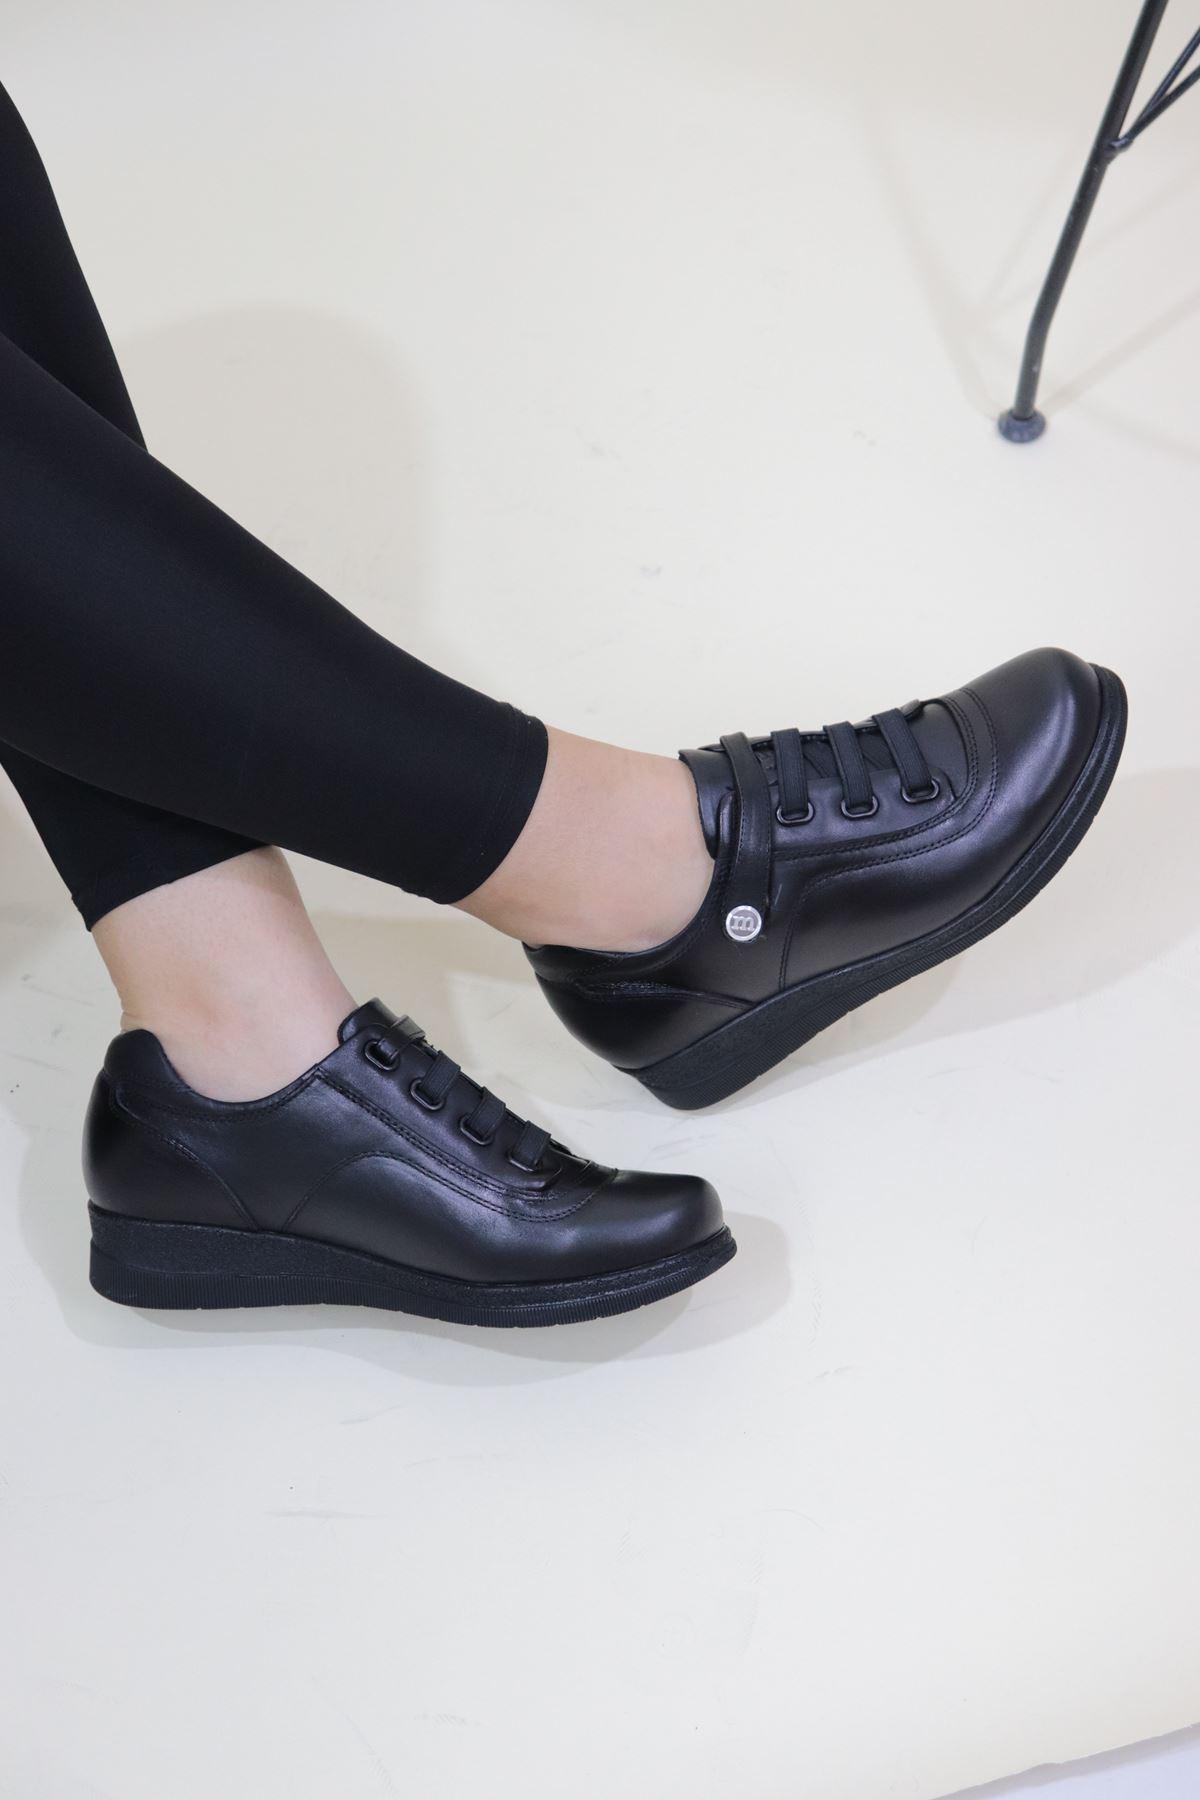 Mammamia - D20KA-675-B Siyah Çırtlı Kadın Ayakkabısı